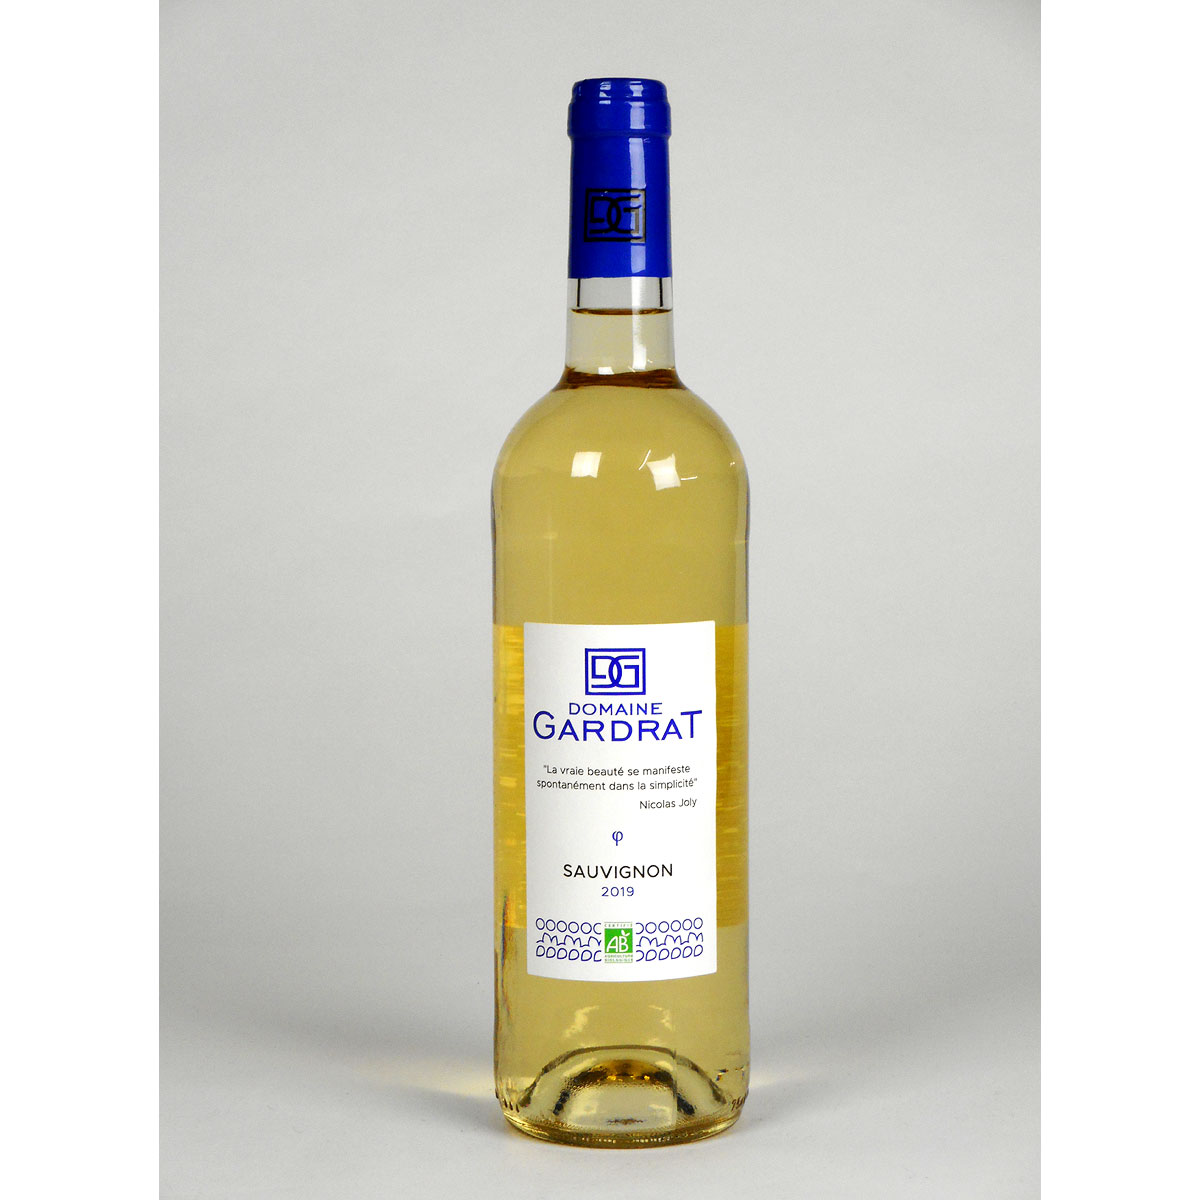 Domaine Gardrat: Vin de Pays Charentais Sauvignon 2019 - Bottle